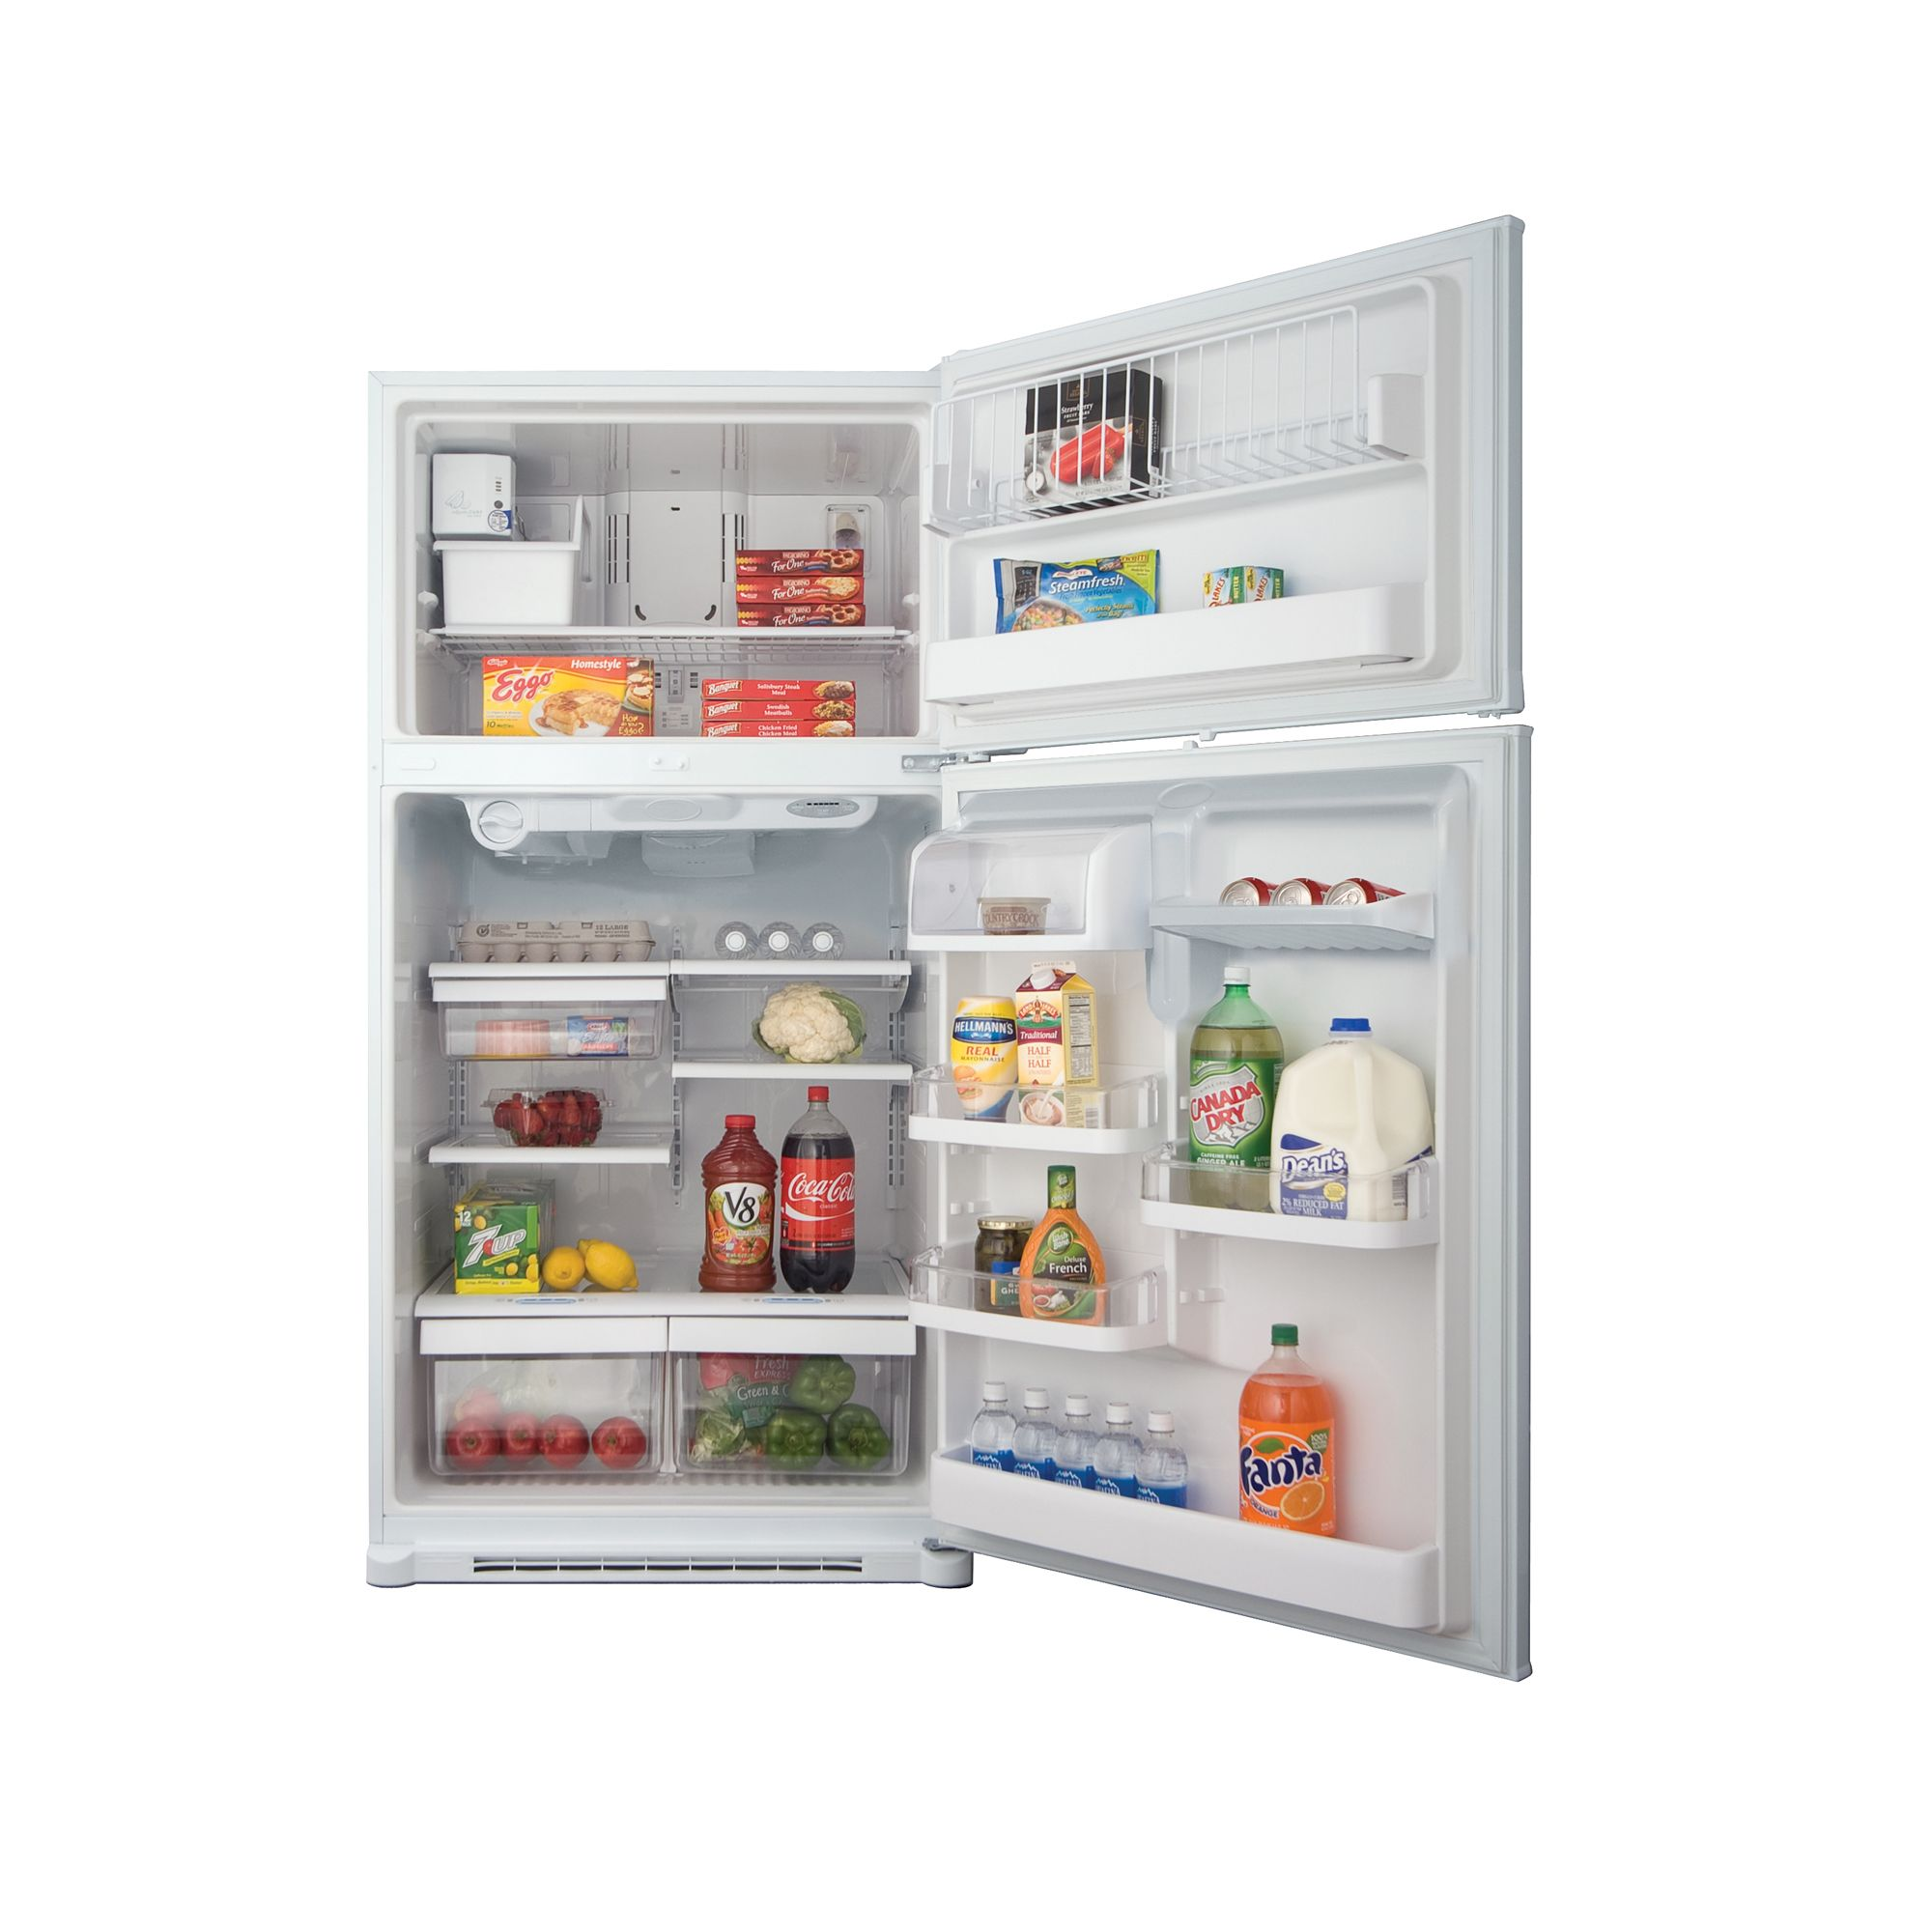 Kenmore 22.0 cu. ft. Top Freezer Refrigerator (7531)